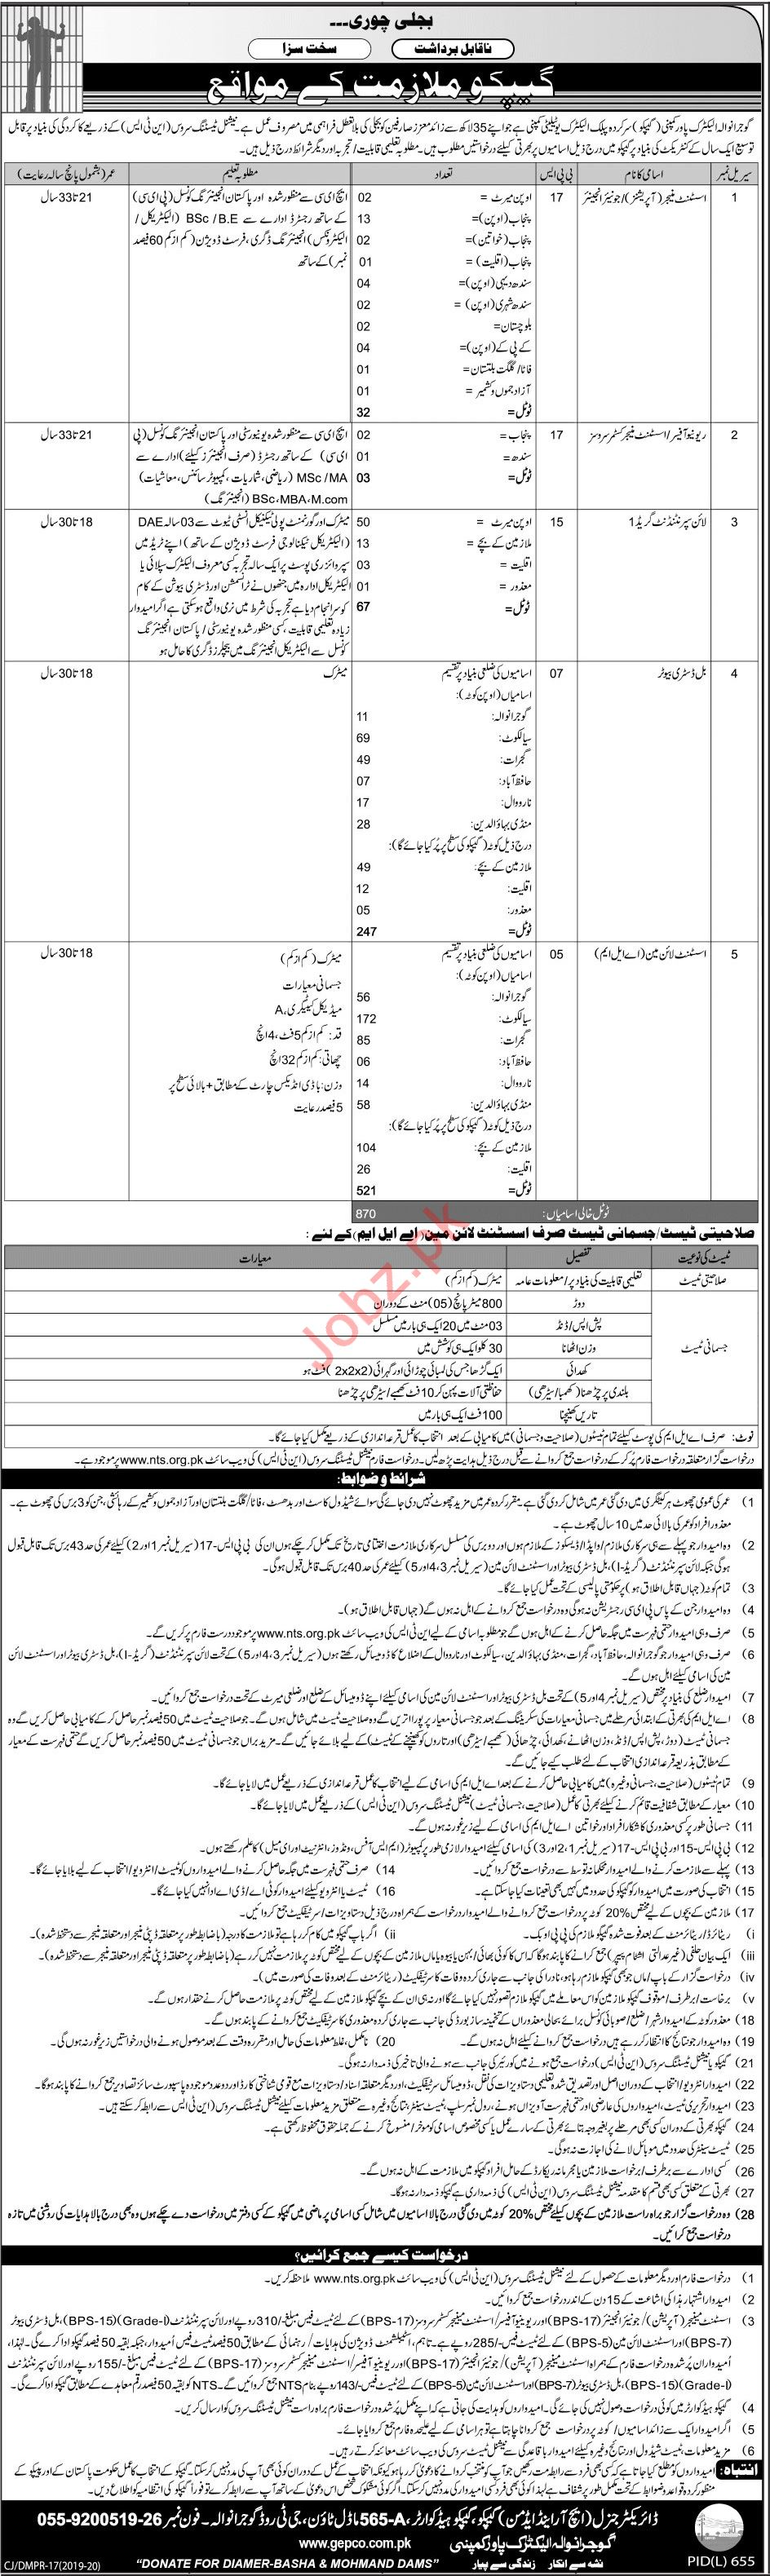 Gujranwala Electric Power Company GEPCO Jobs via NTS